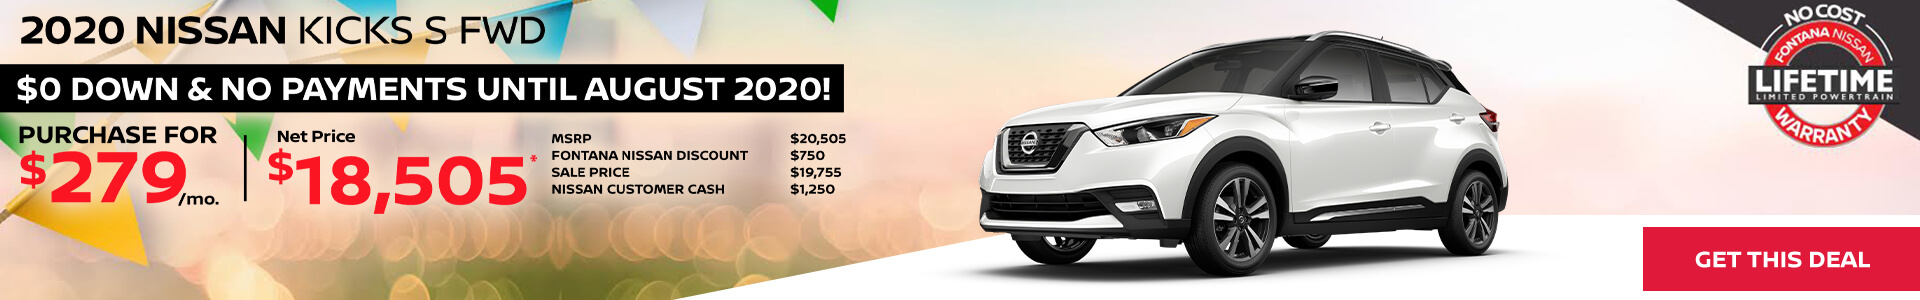 Nissan Kicks $279